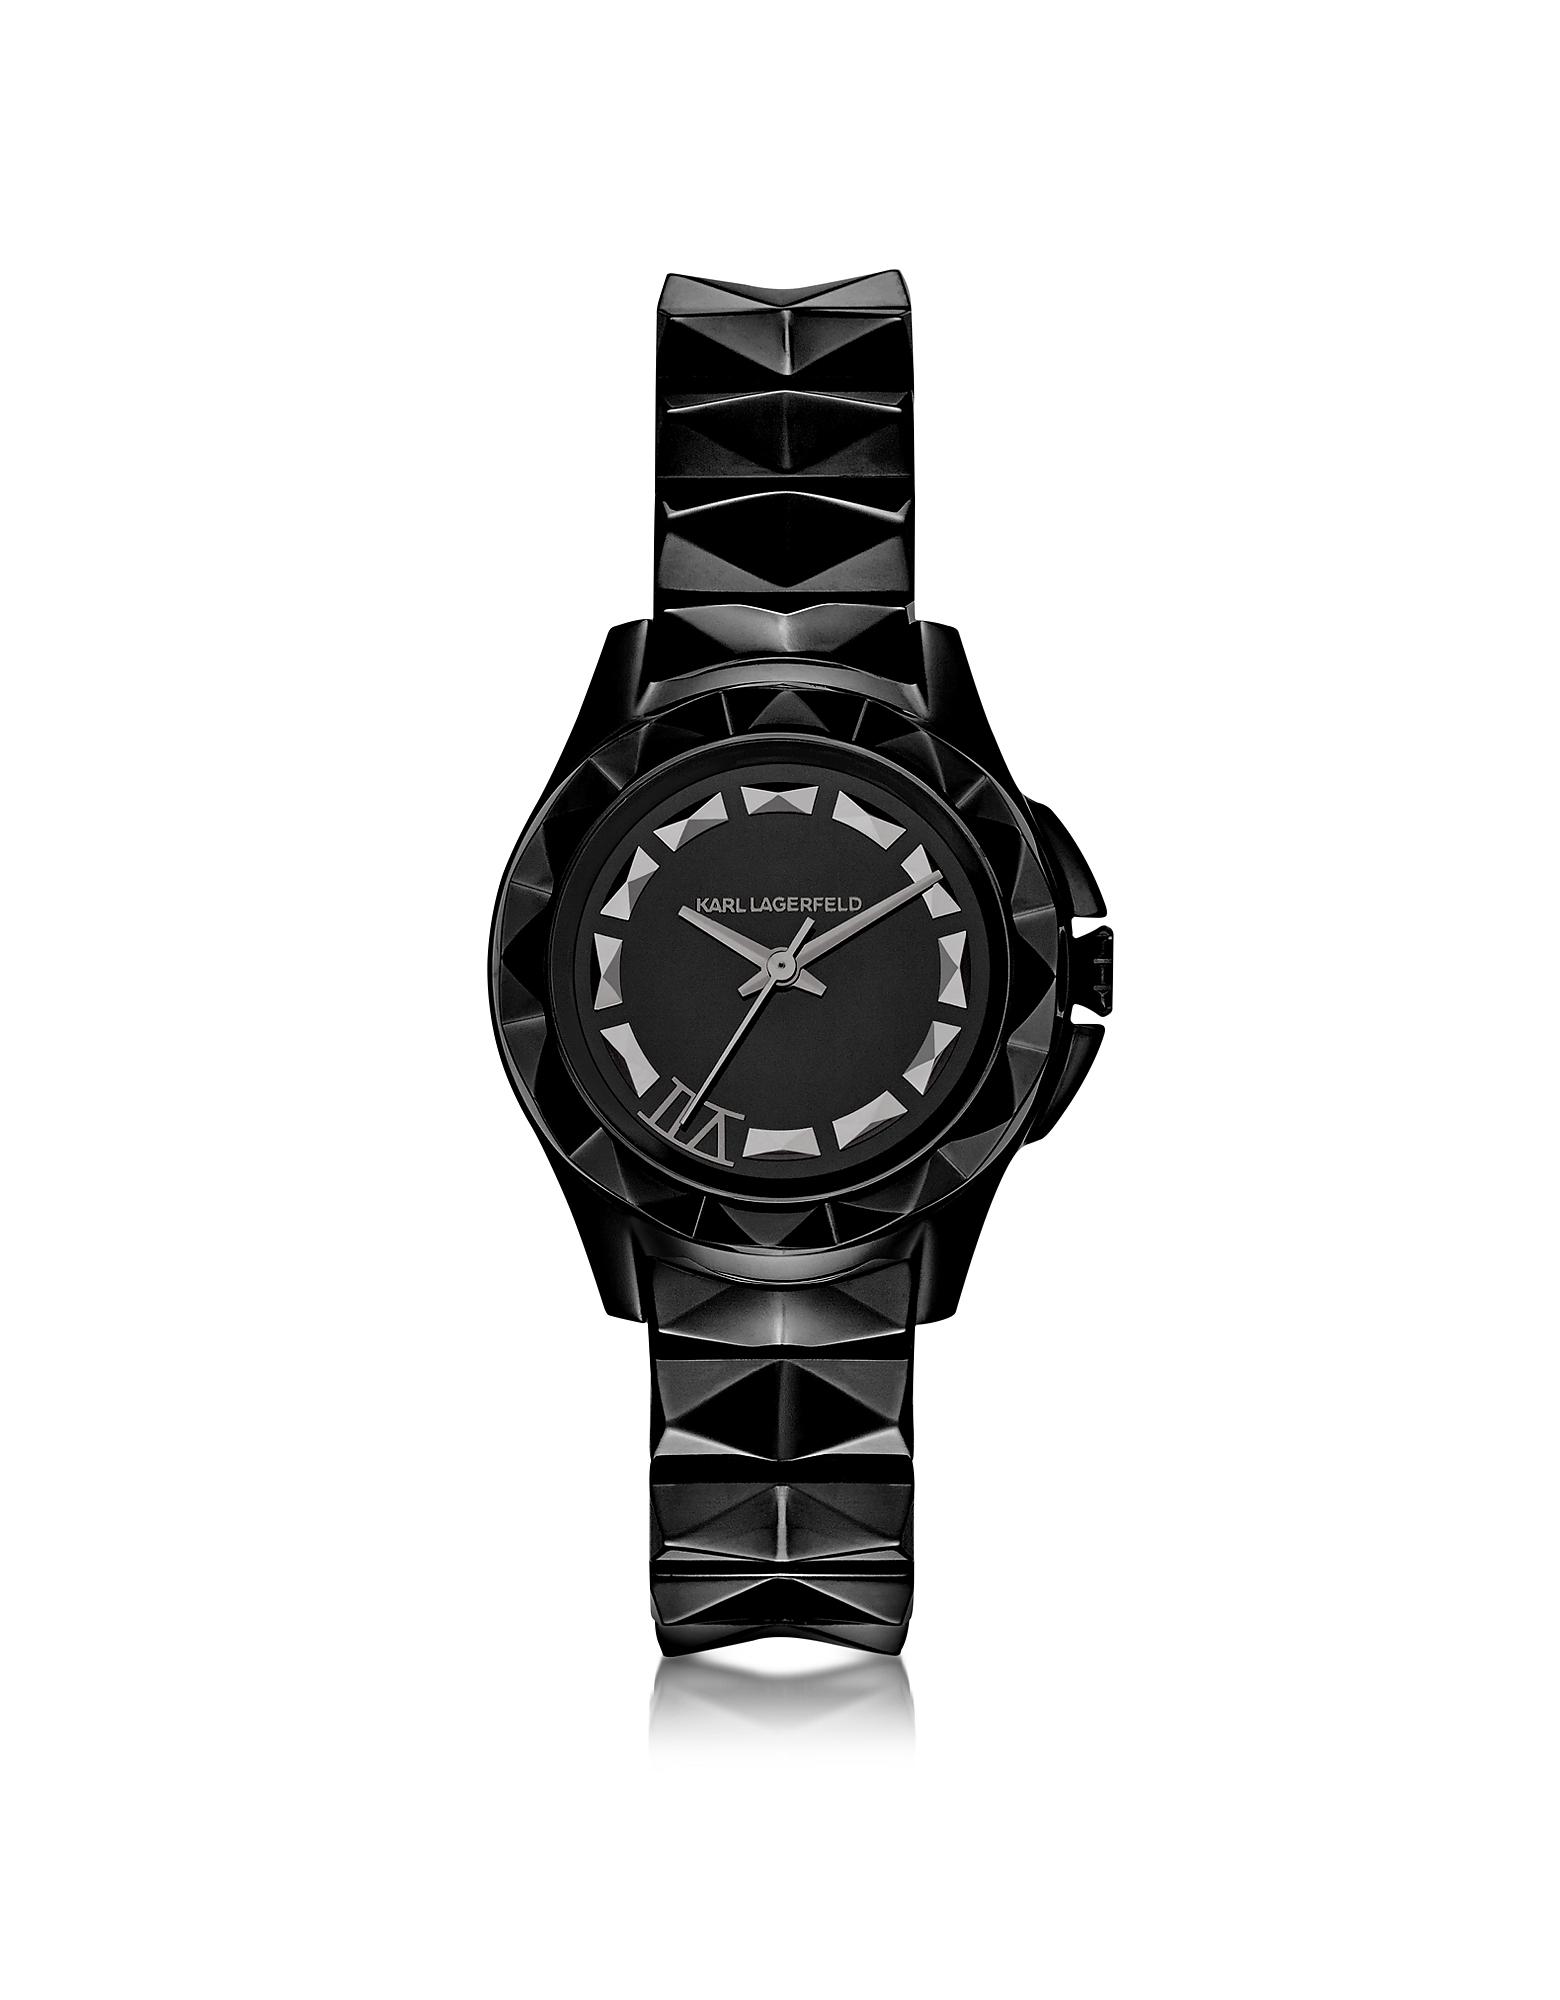 Karl Lagerfeld Karl 7- 30 мм Черные Женские Часы из Нержавеющей Стали